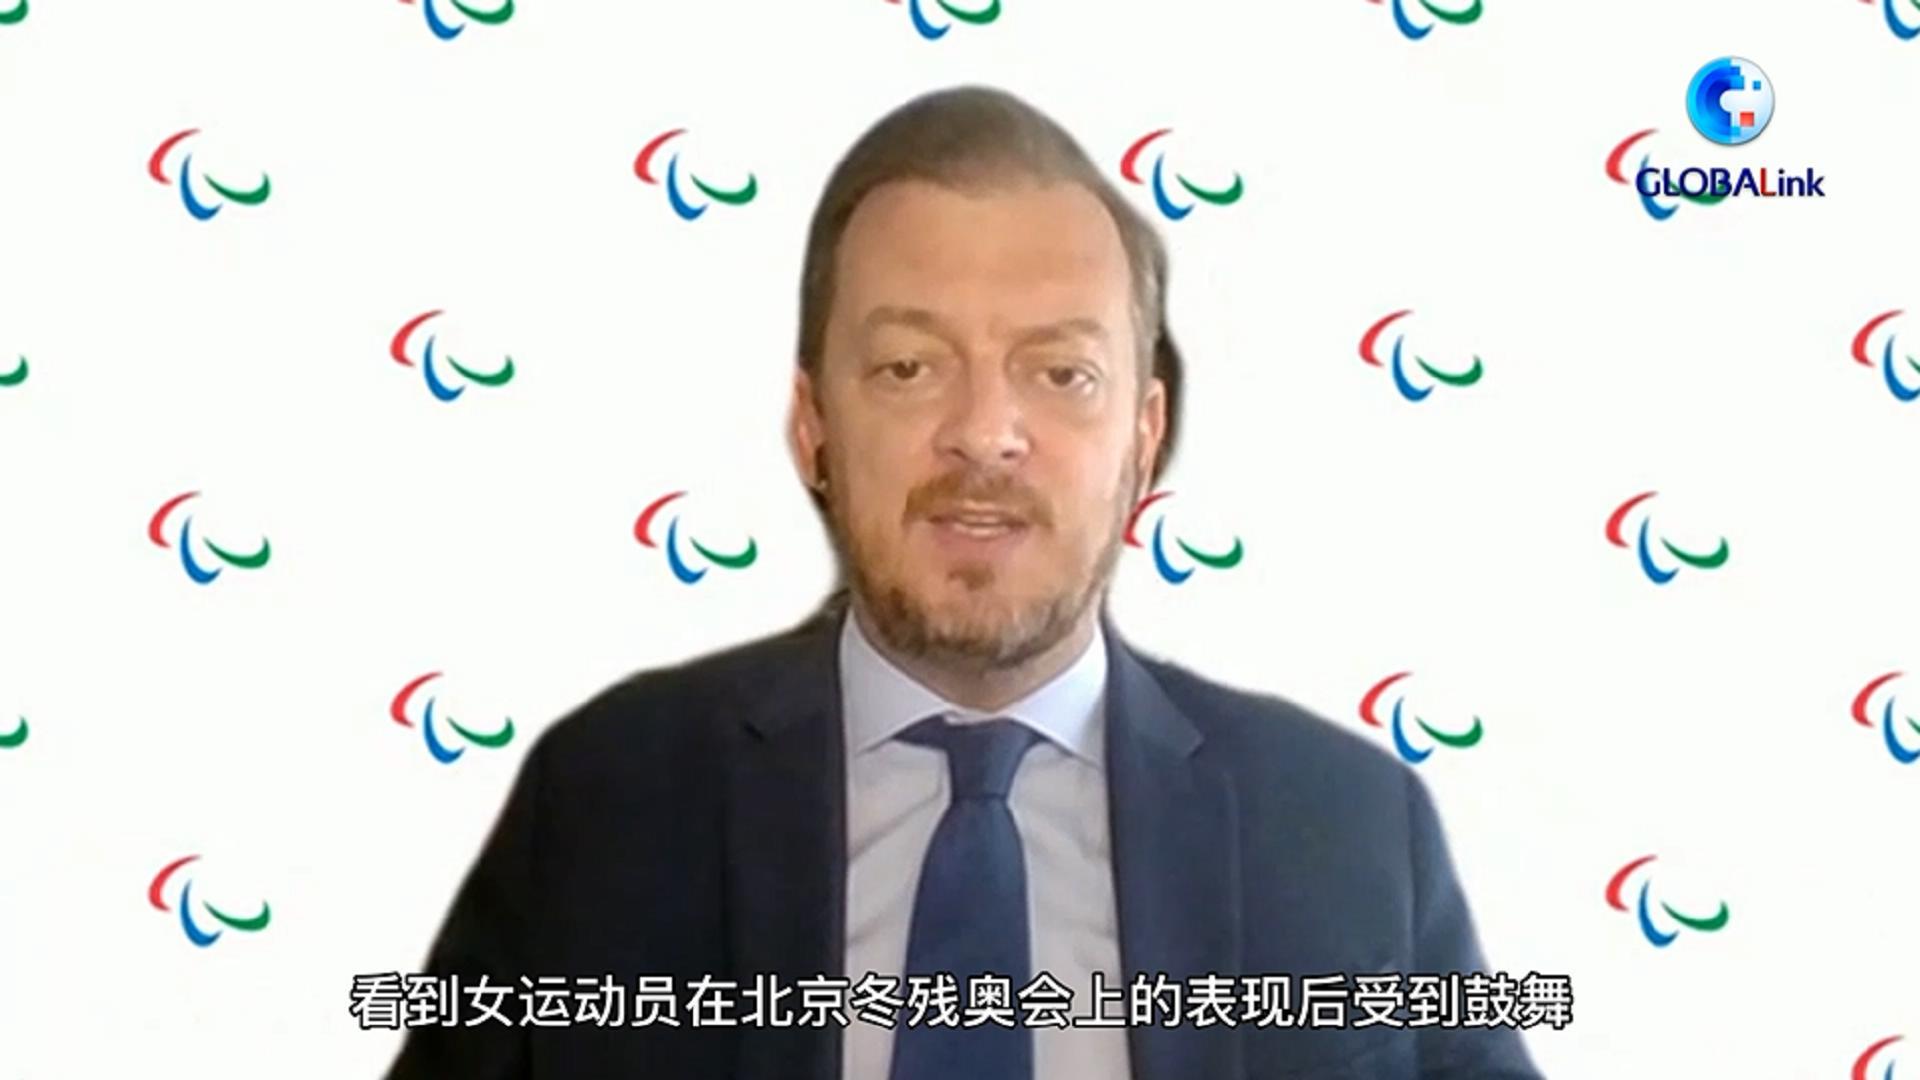 GLOBALink | IPC President: Beijing will amaze the world in 2022